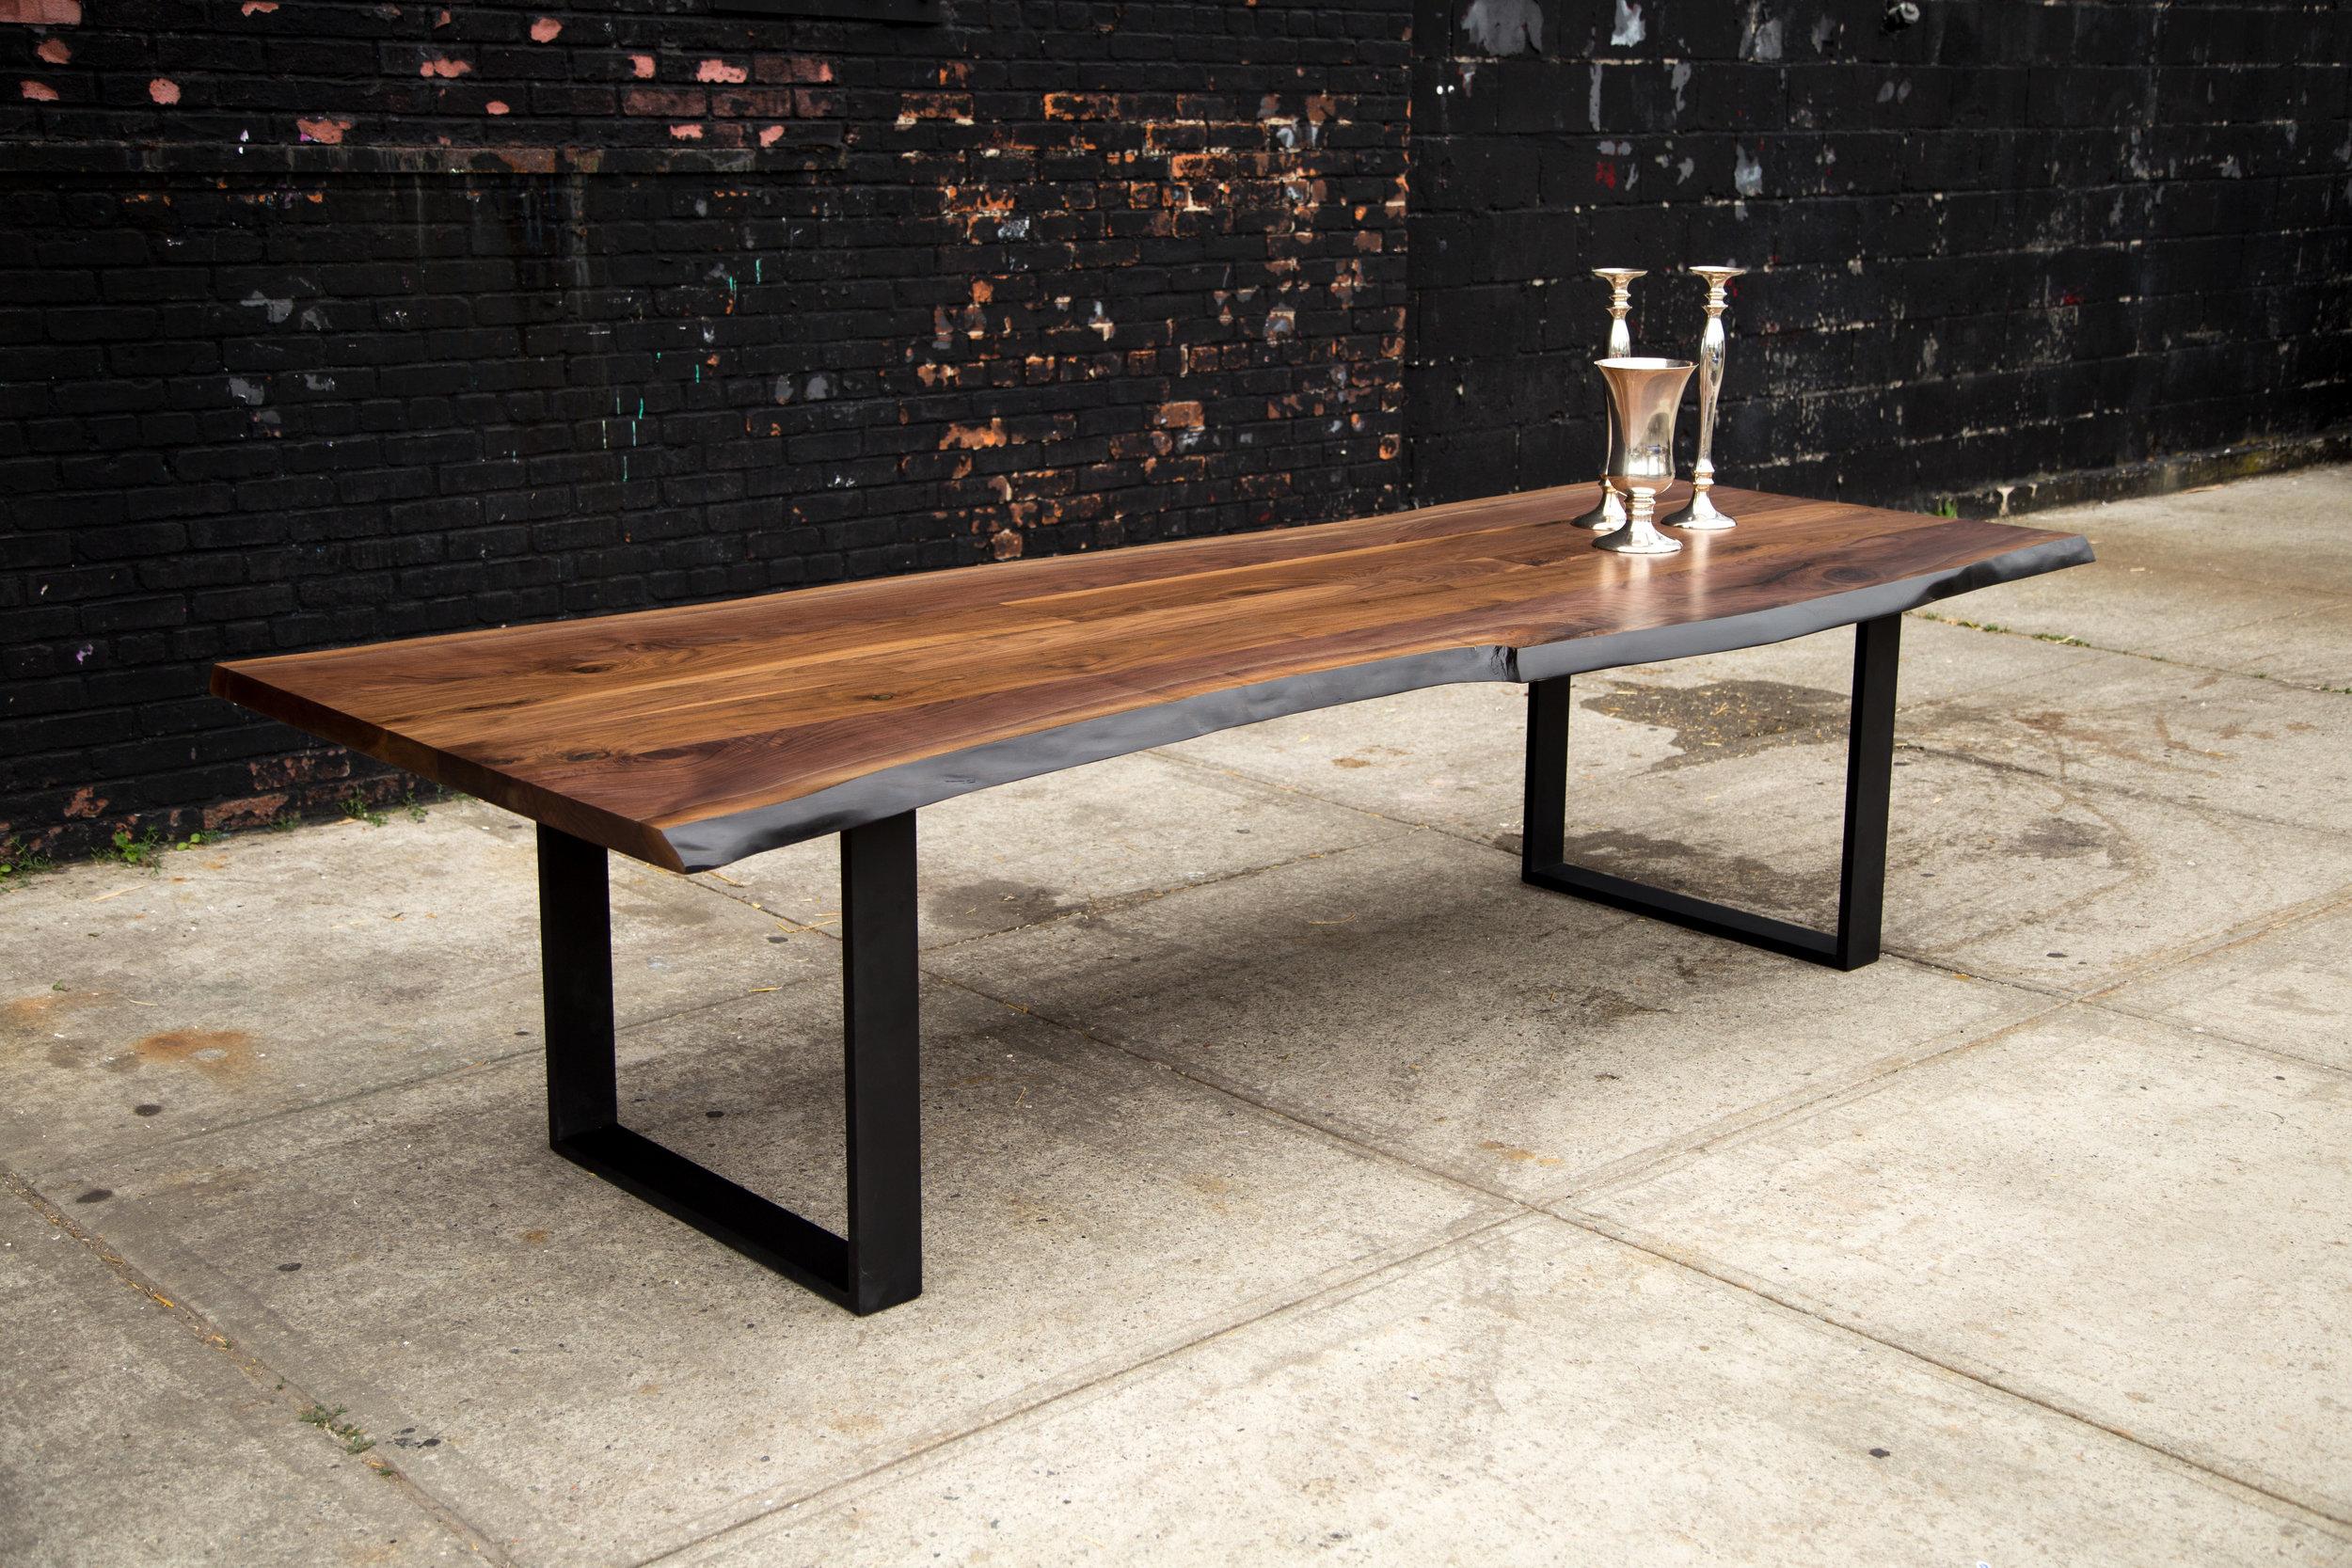 SENTIENT American Black Walnut Signature Live Edge Table with Blackened Steel Frame Legs